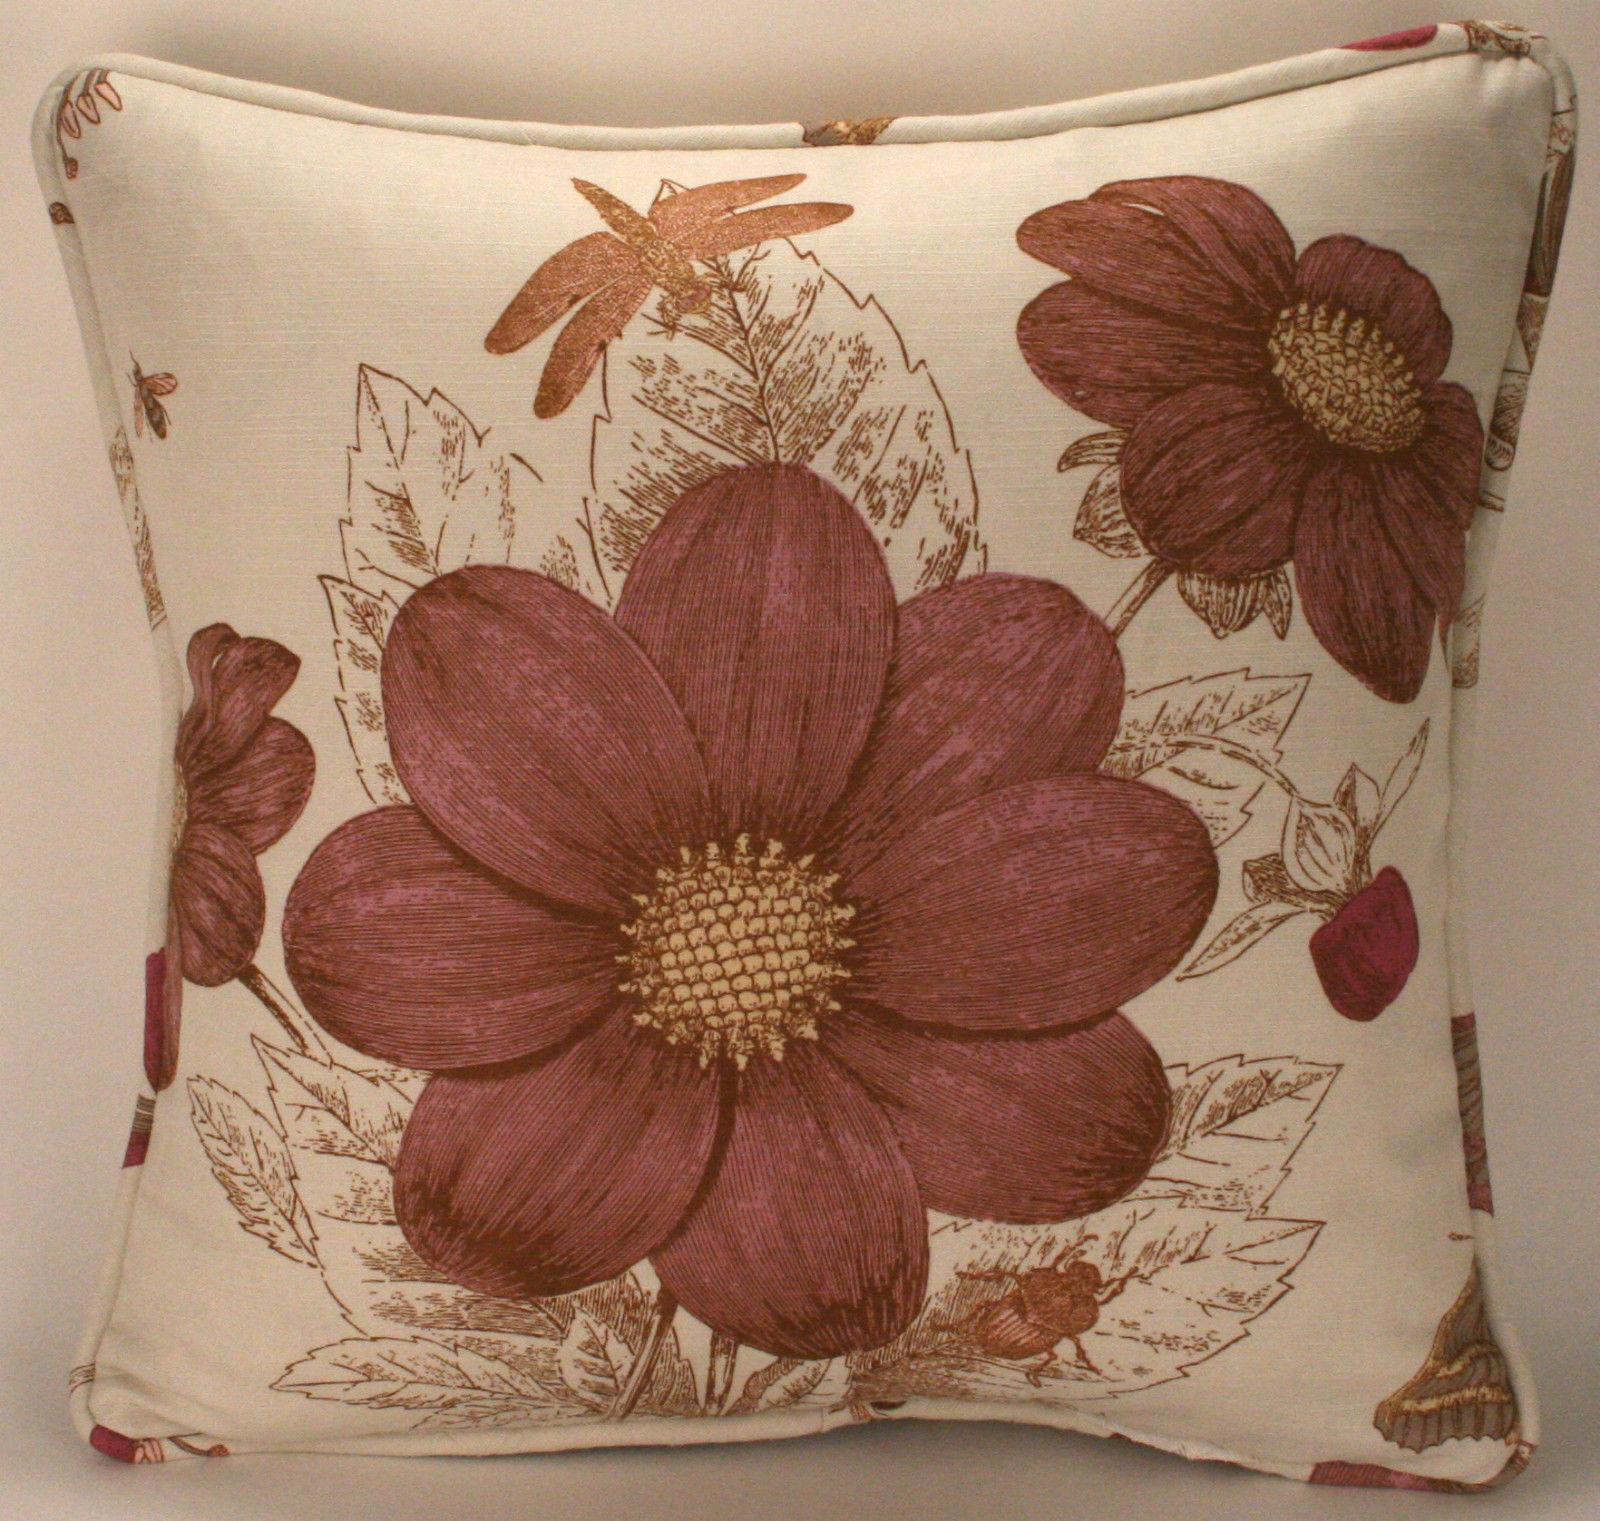 Islandia Designs pillows and more